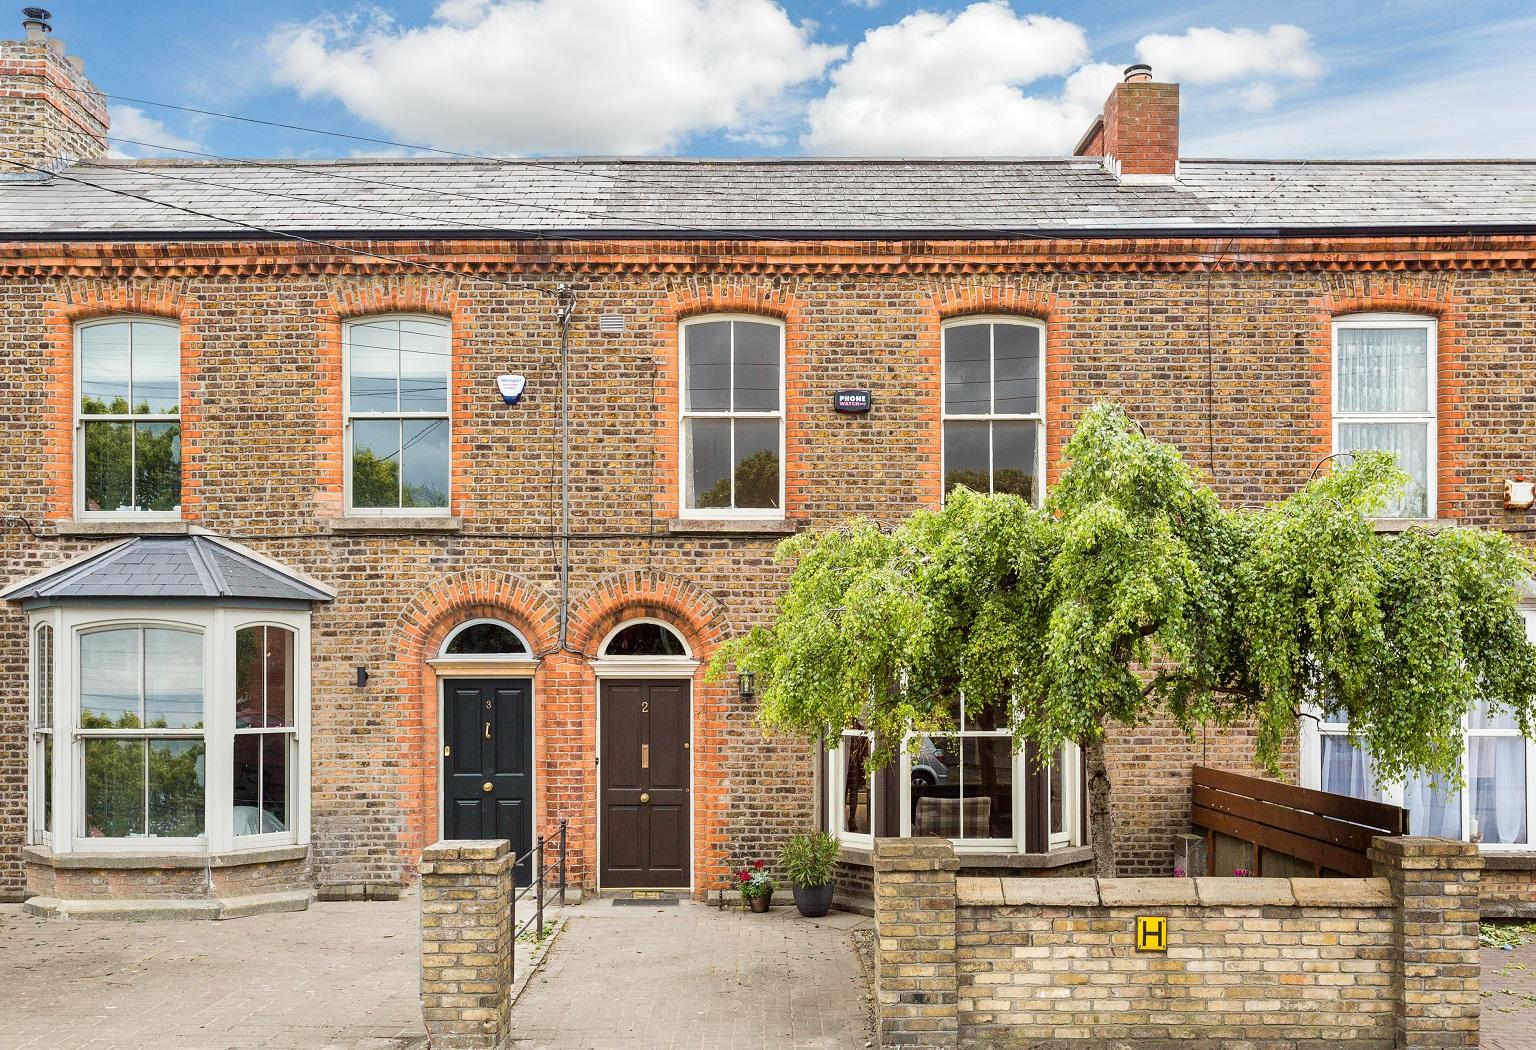 2 Bayview, Pembroke Street, Irishtown, Dublin 4